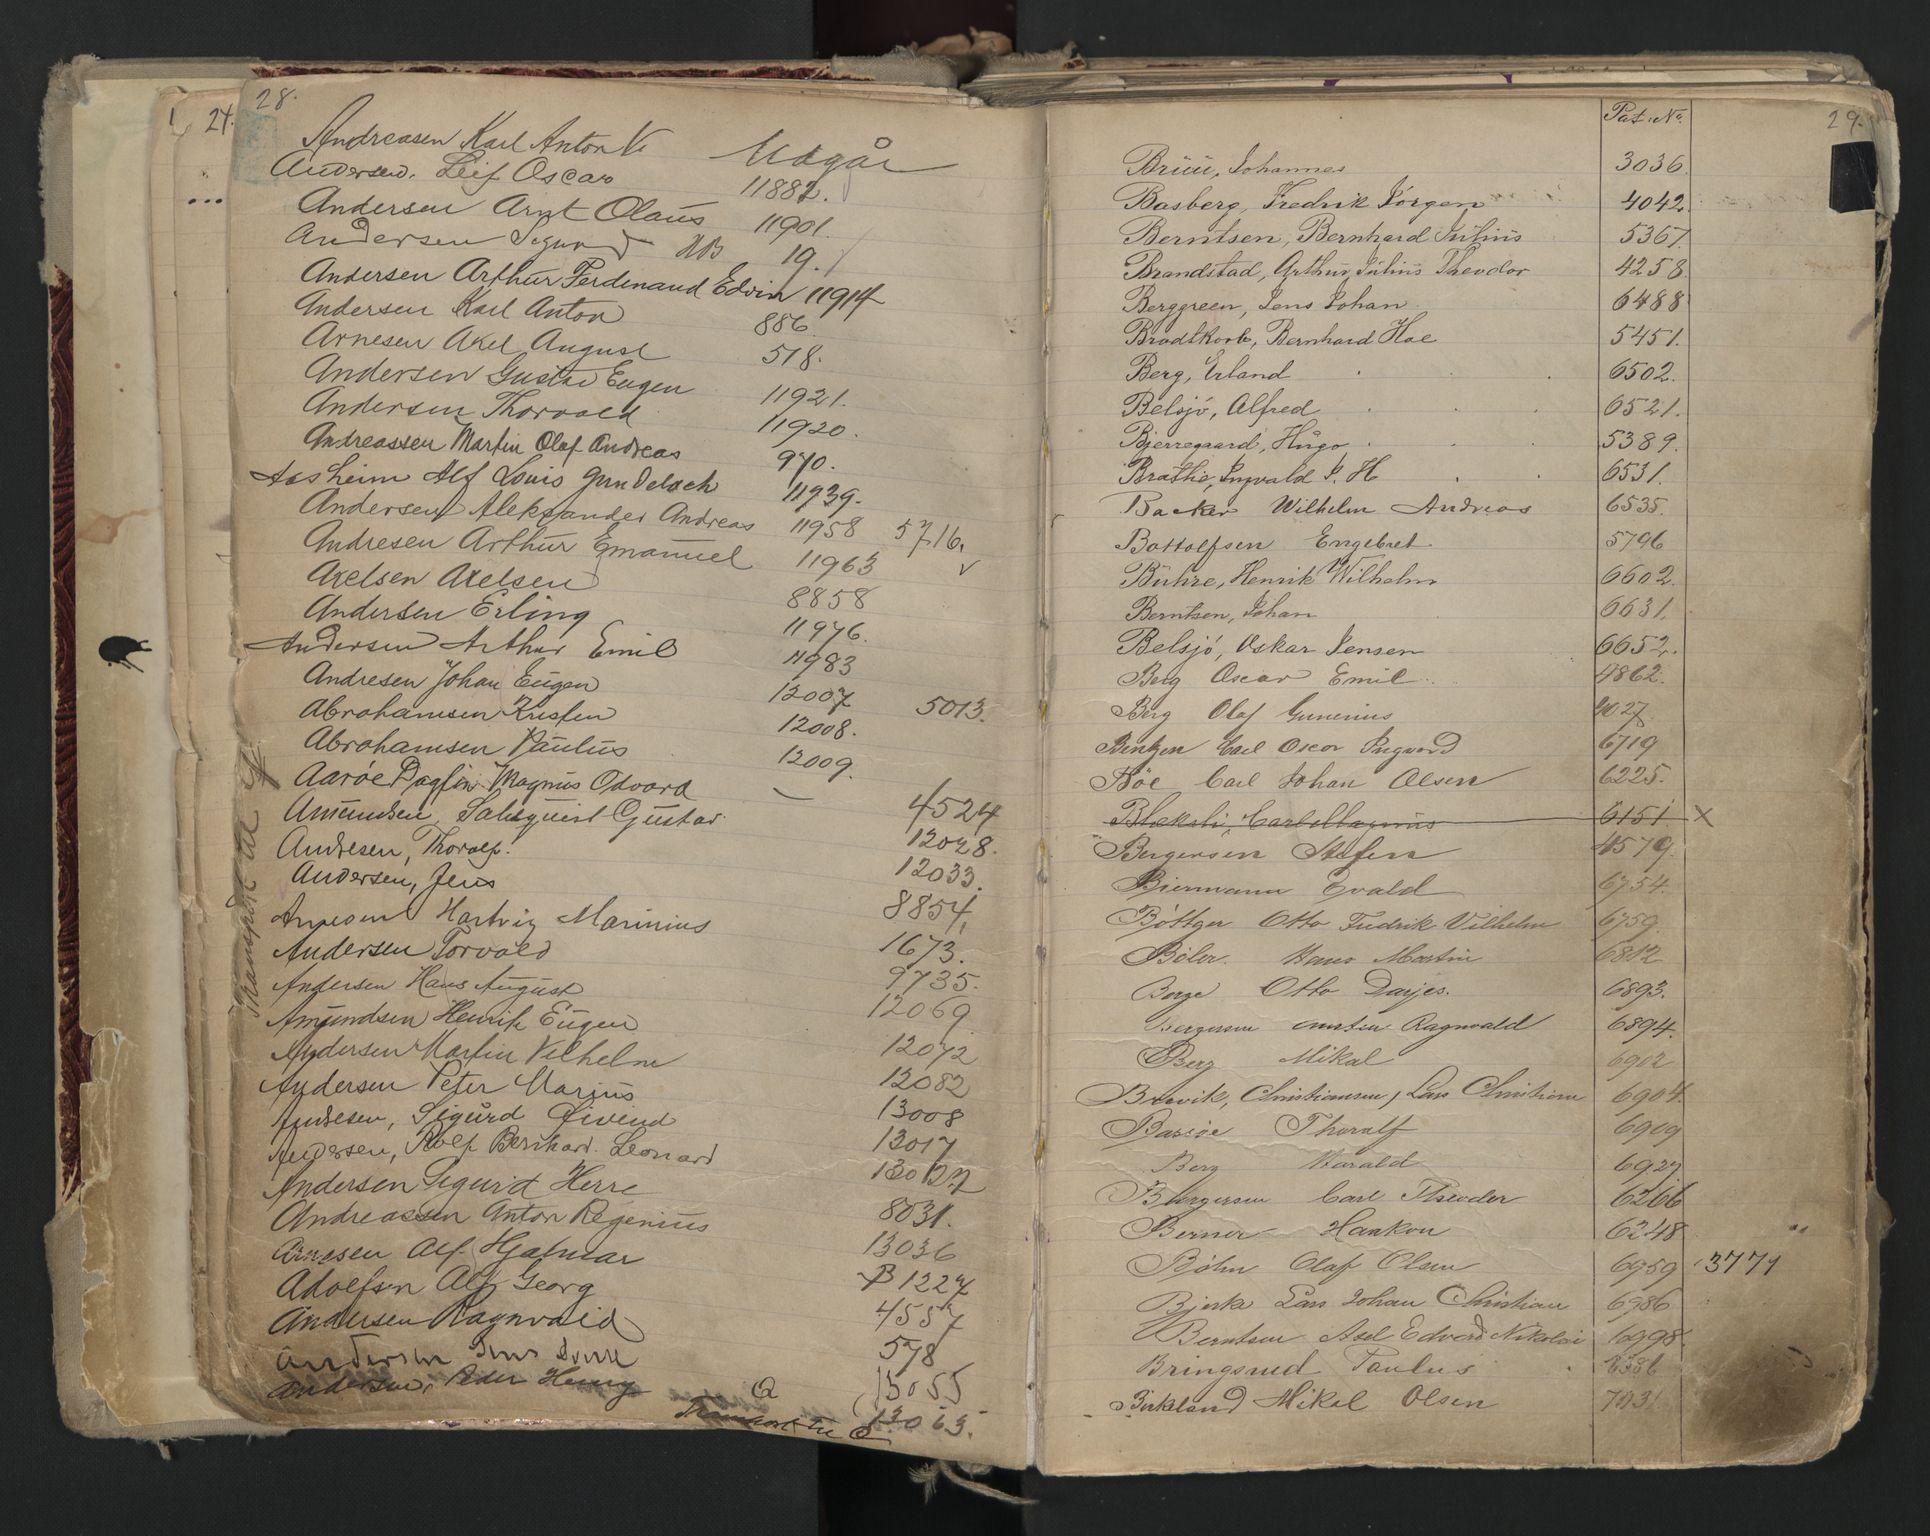 SAO, Oslo sjømannskontor, F/Fa/L0002: Register for Kristiania krets, 1866-1930, s. 28-29